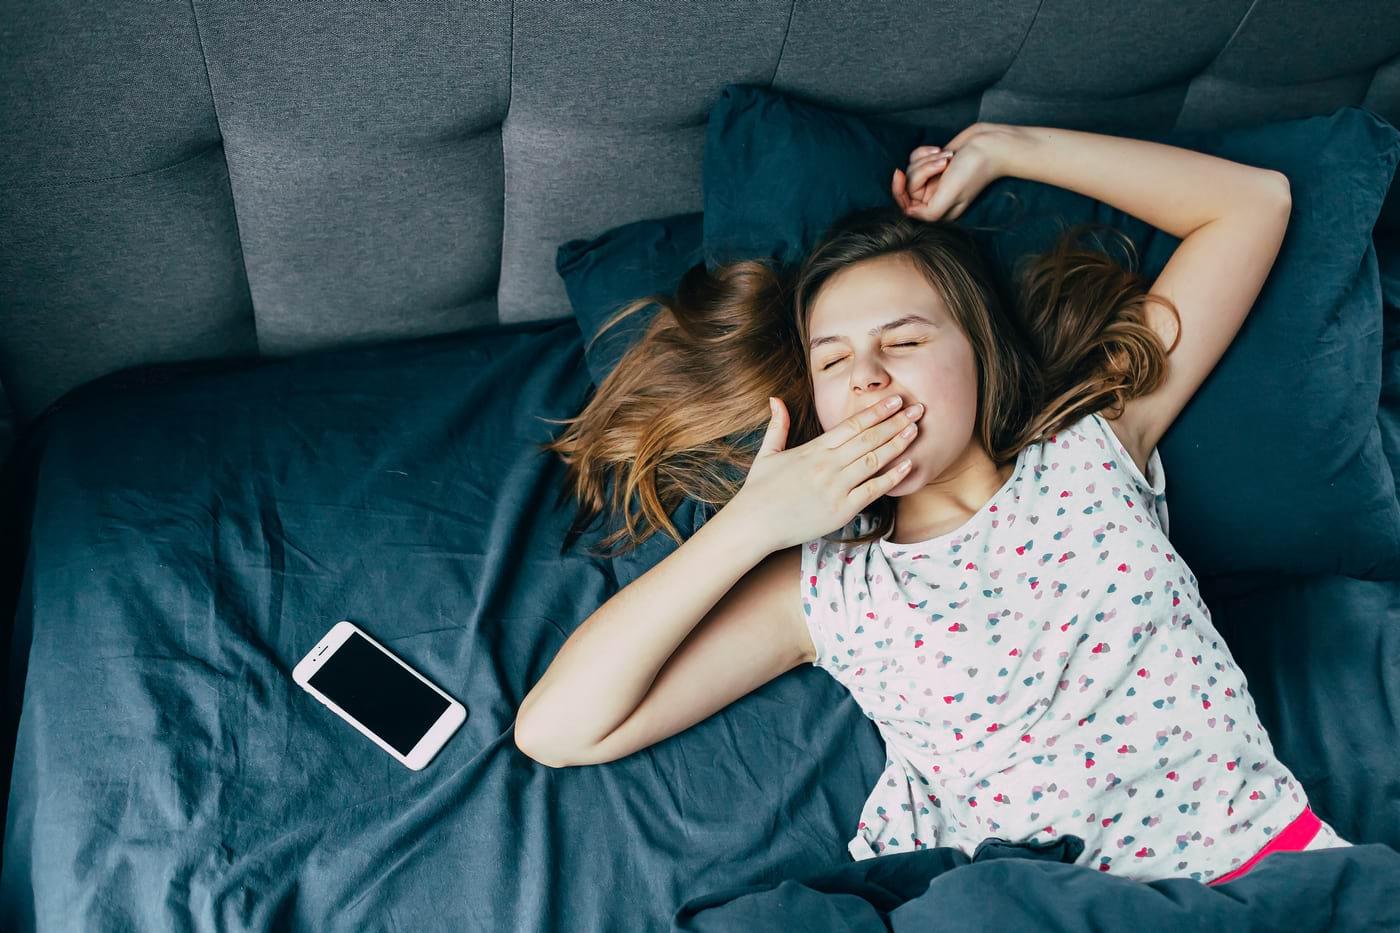 Somnul insuficient și riscul de comportament sexual periculos